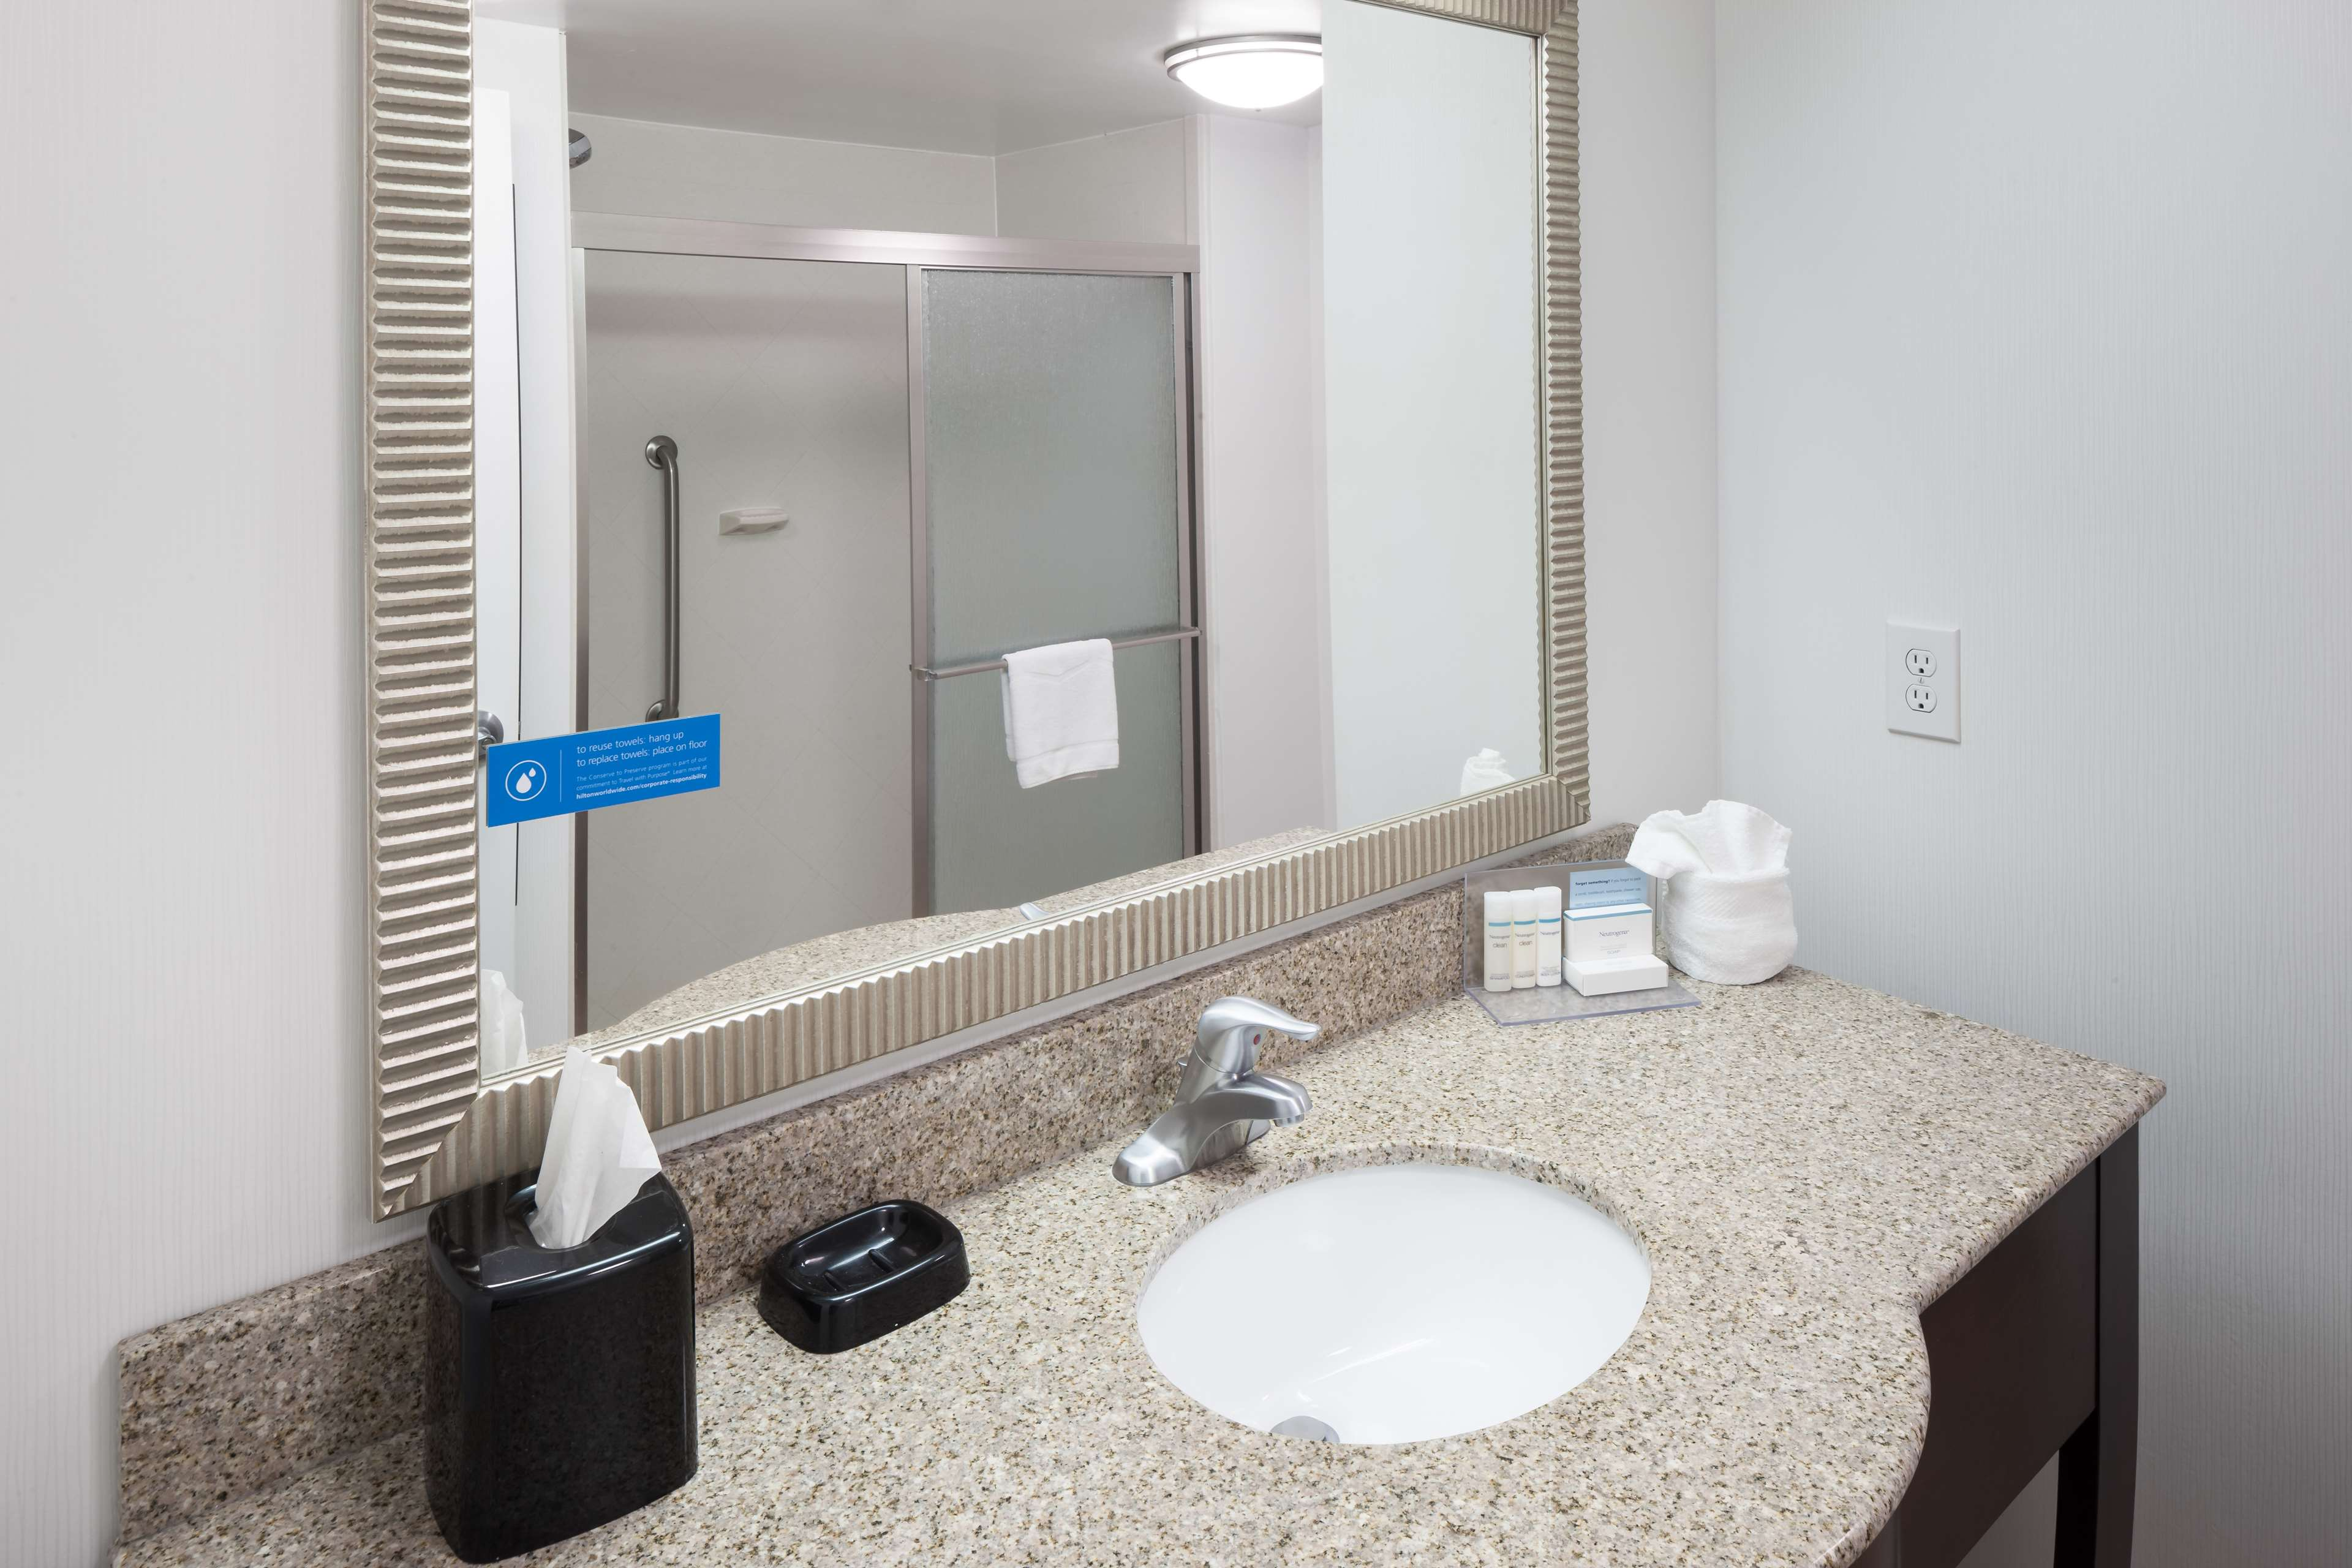 Hampton Inn & Suites Panama City Beach-Pier Park Area image 22